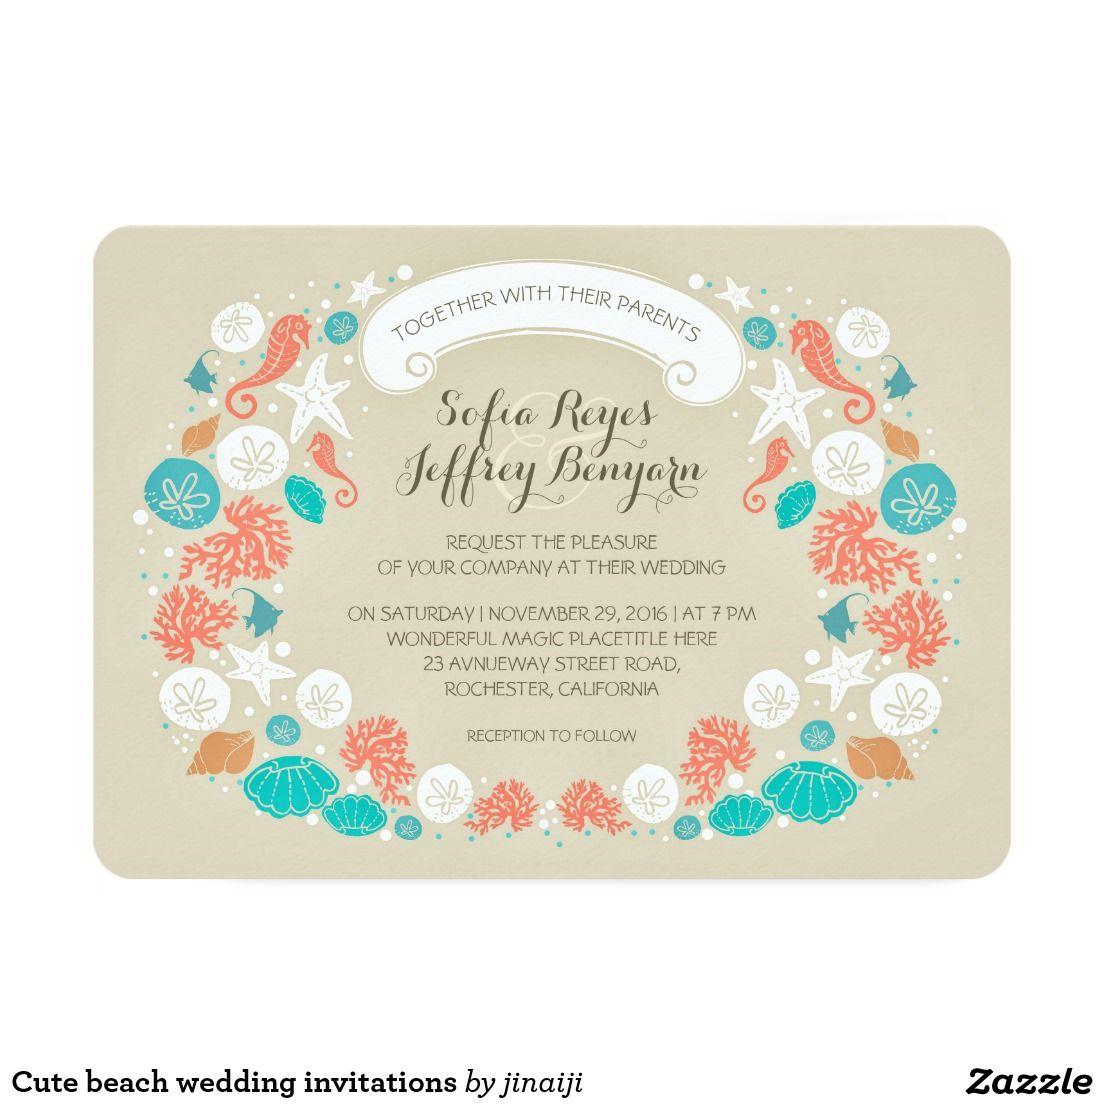 Cute beach wedding invitations | Creative Wedding Invitations ...